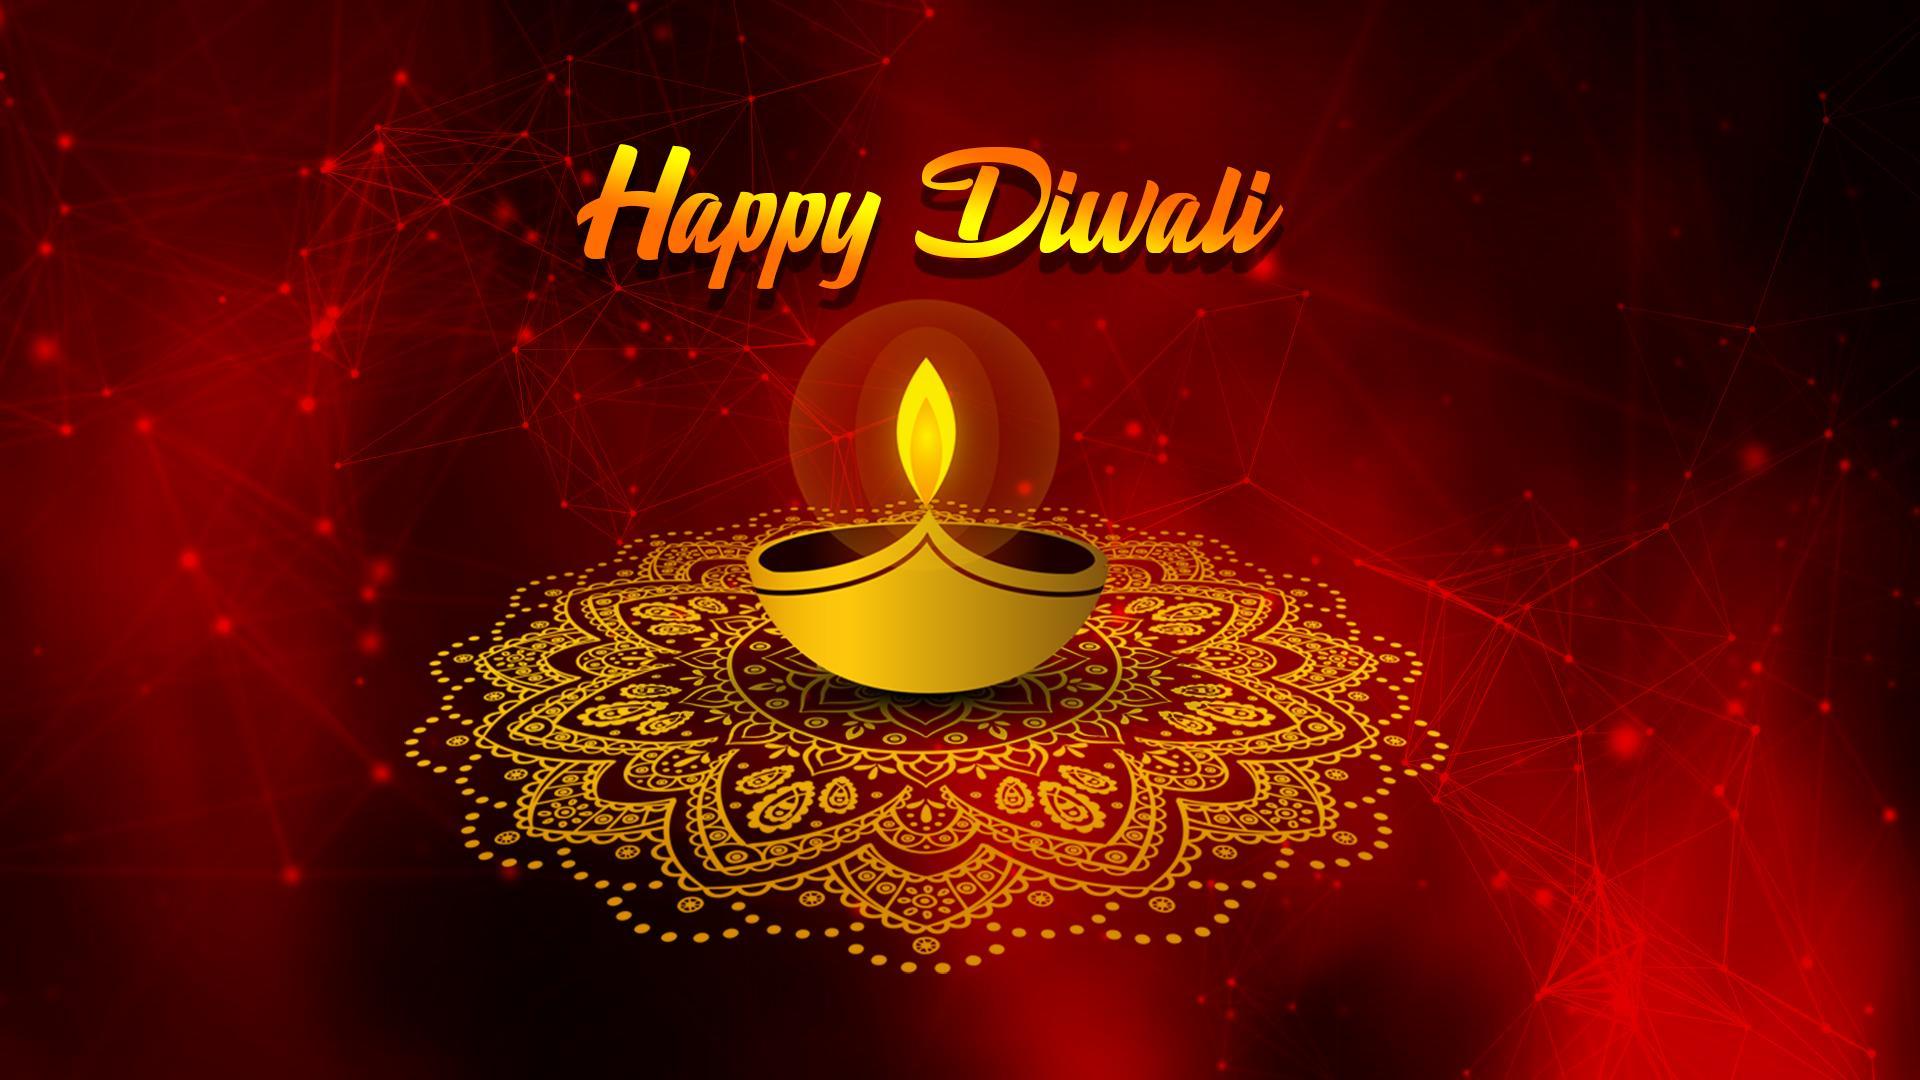 Download Diwali Hd Wallpaper Hd Backgrounds Download Itl Cat